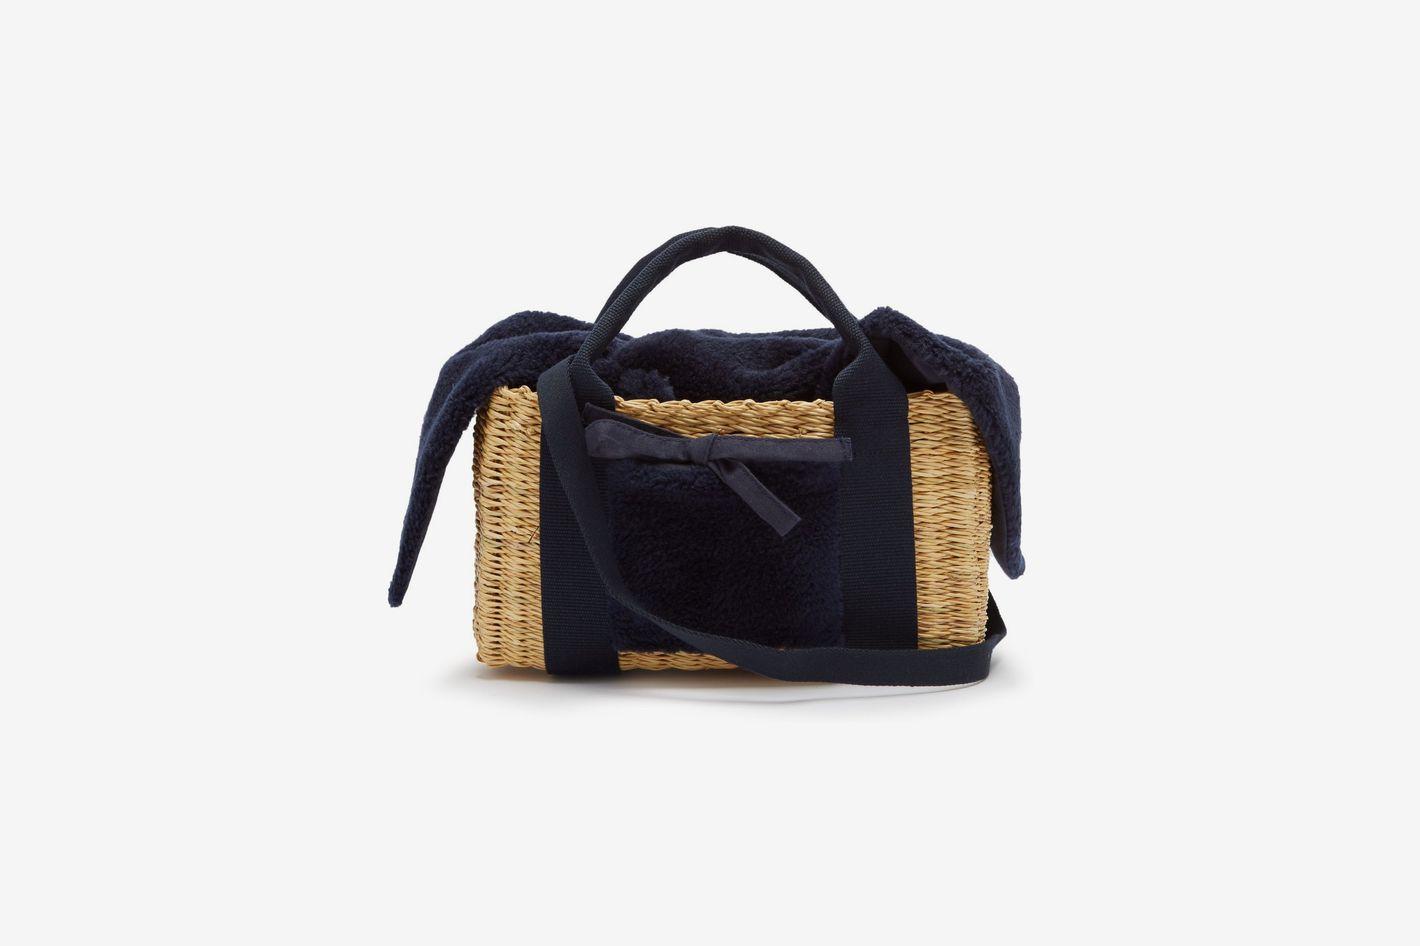 Muun Manon Shearling and Woven Straw Bag